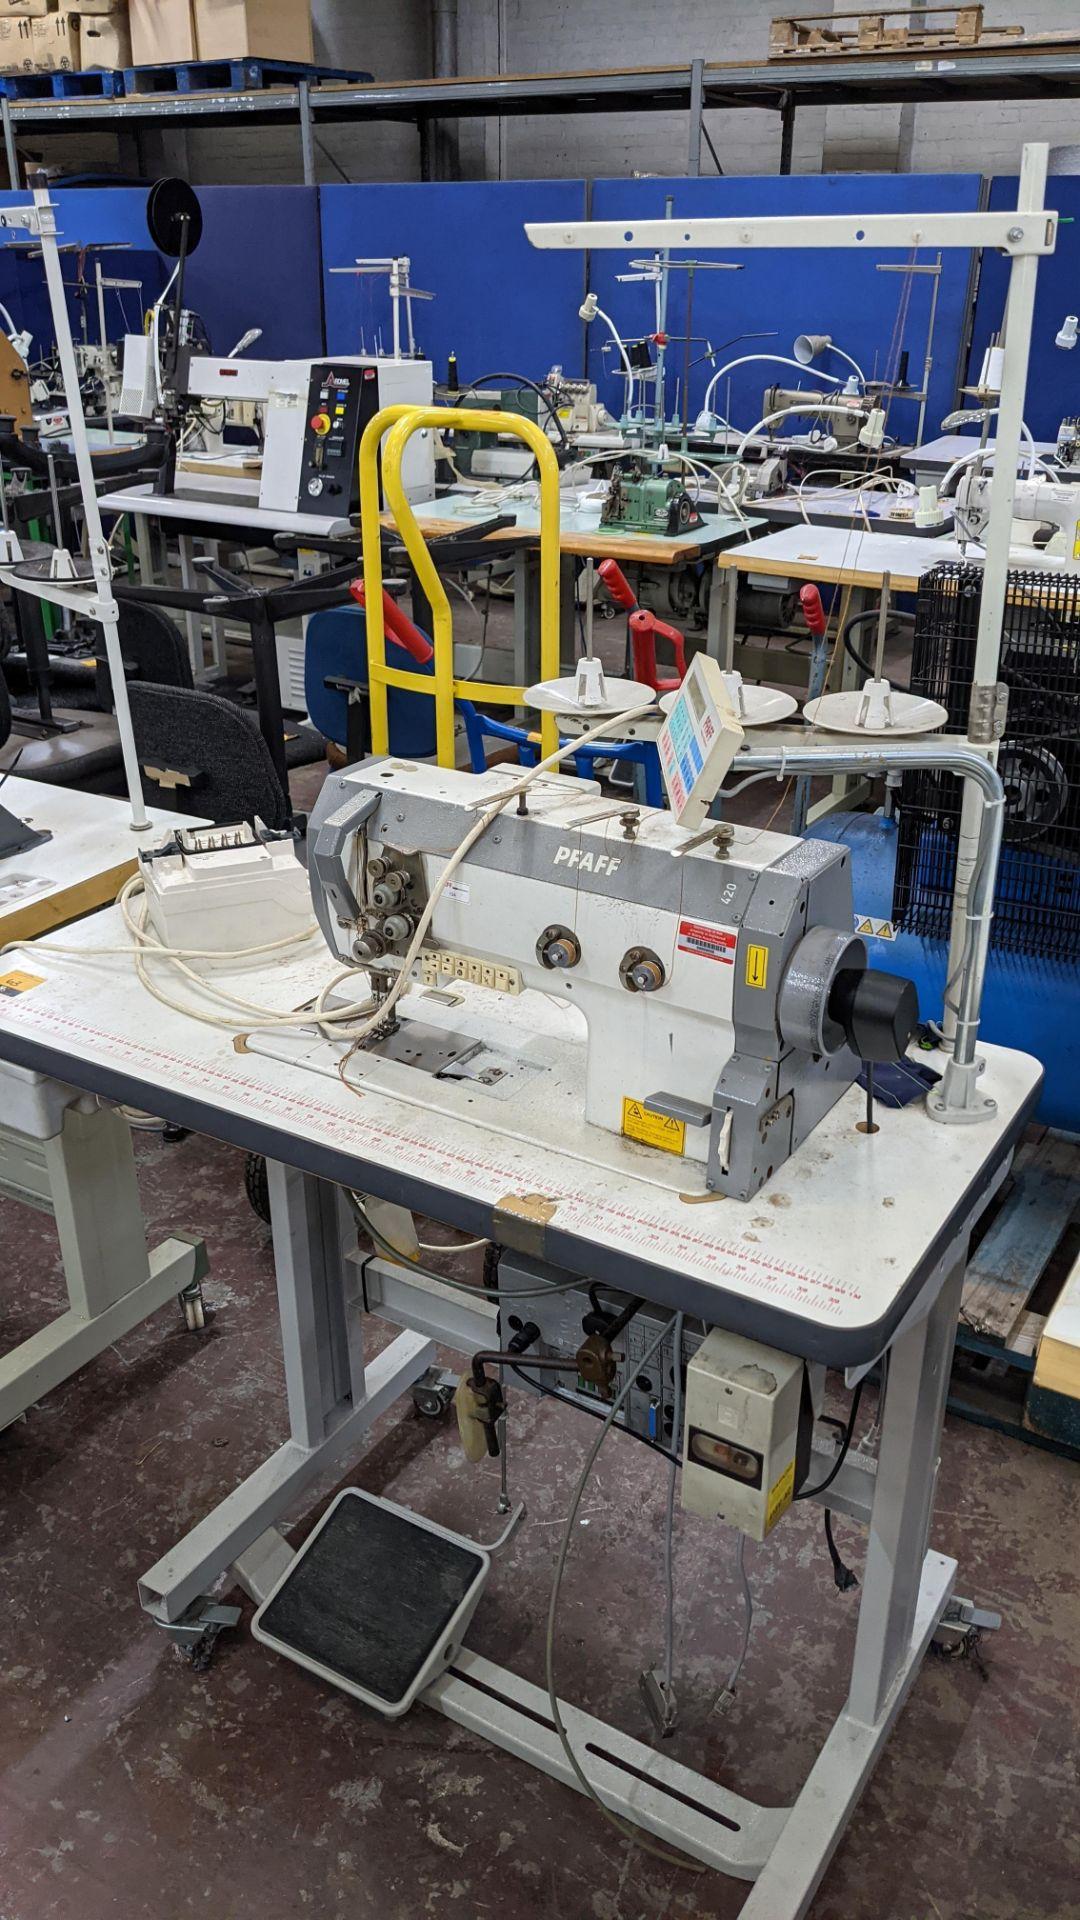 Pfaff twin needle sewing machine, model 422 - Image 3 of 17